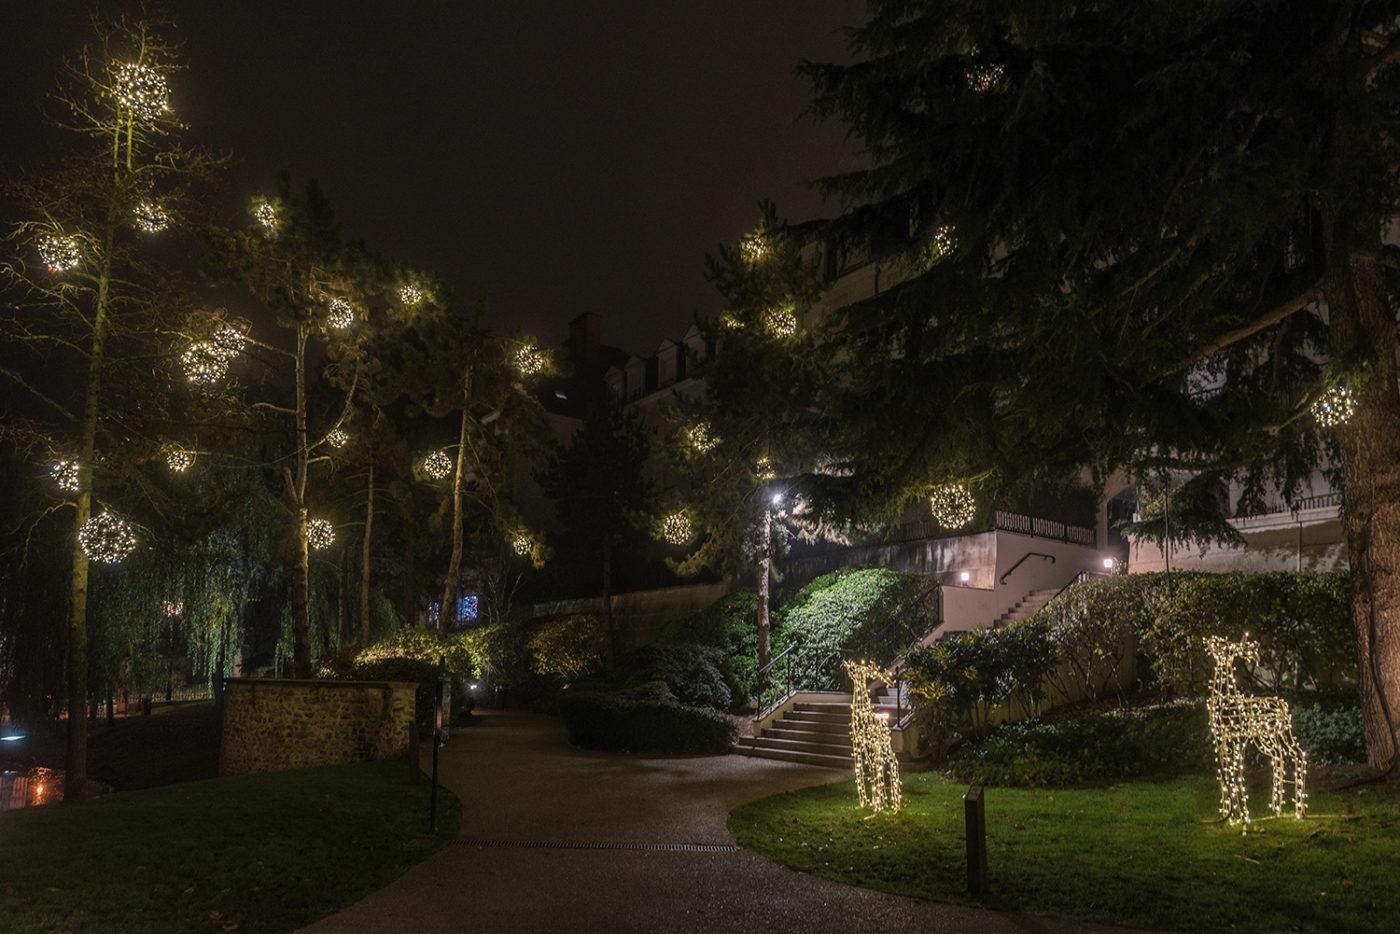 Illumination Plessis parc 2019